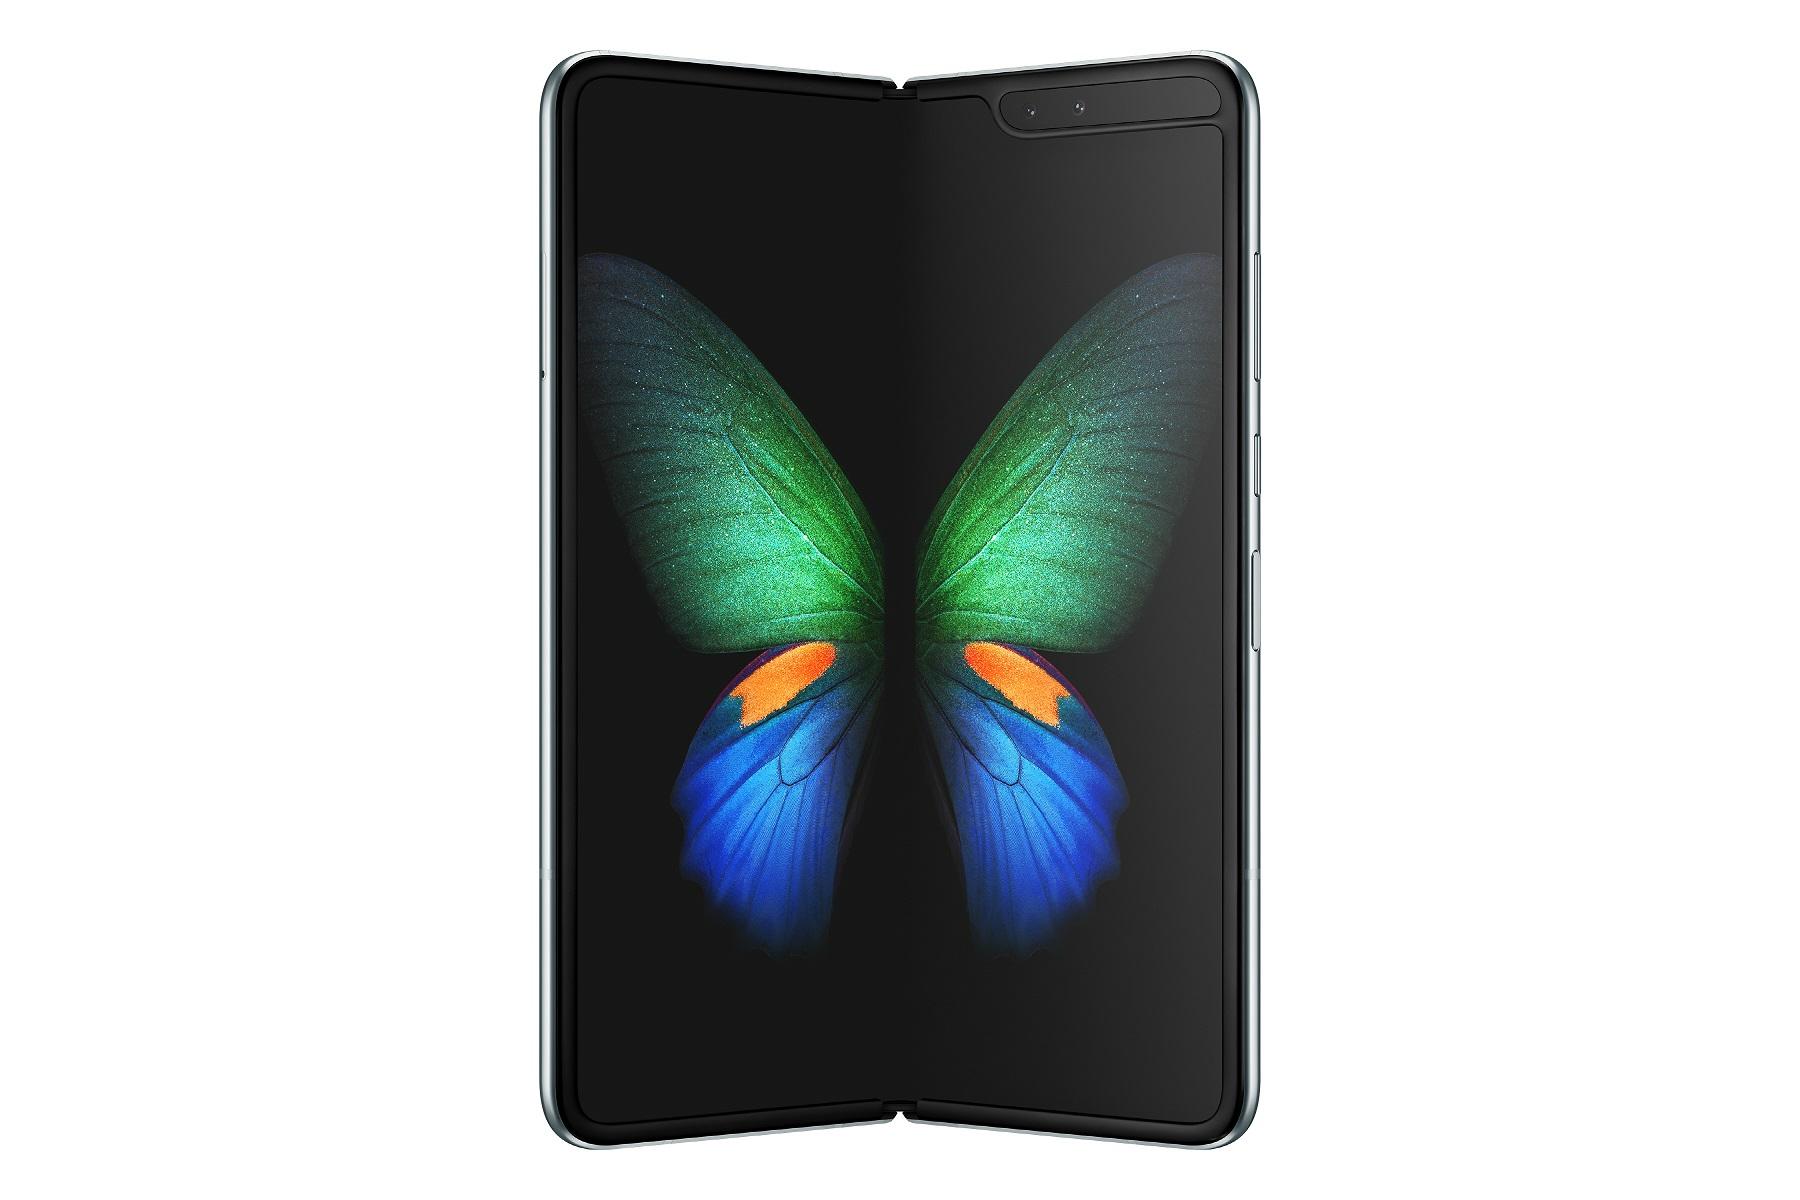 https://www.ictna.ir/Samsung%20Galaxy%20Fold_3.jpg